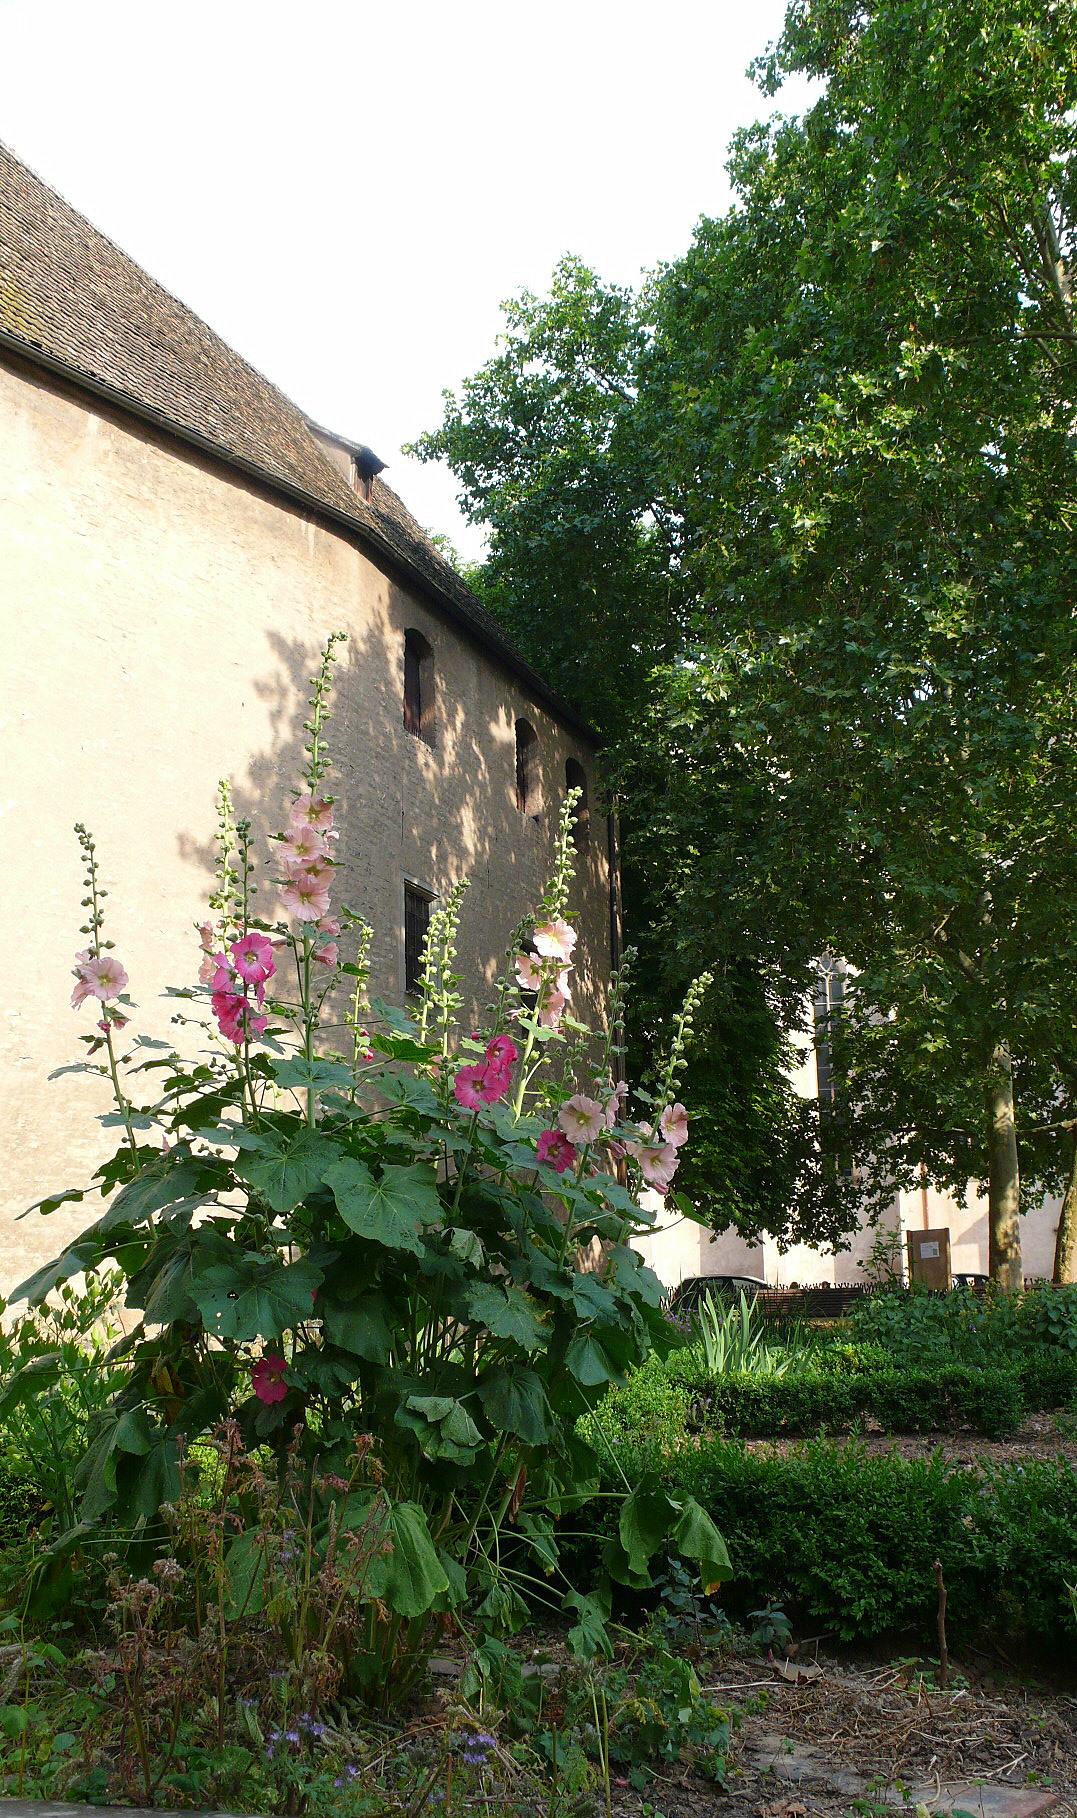 Le jardin secret catherine burg artwork celeste prize for Le jardin secret